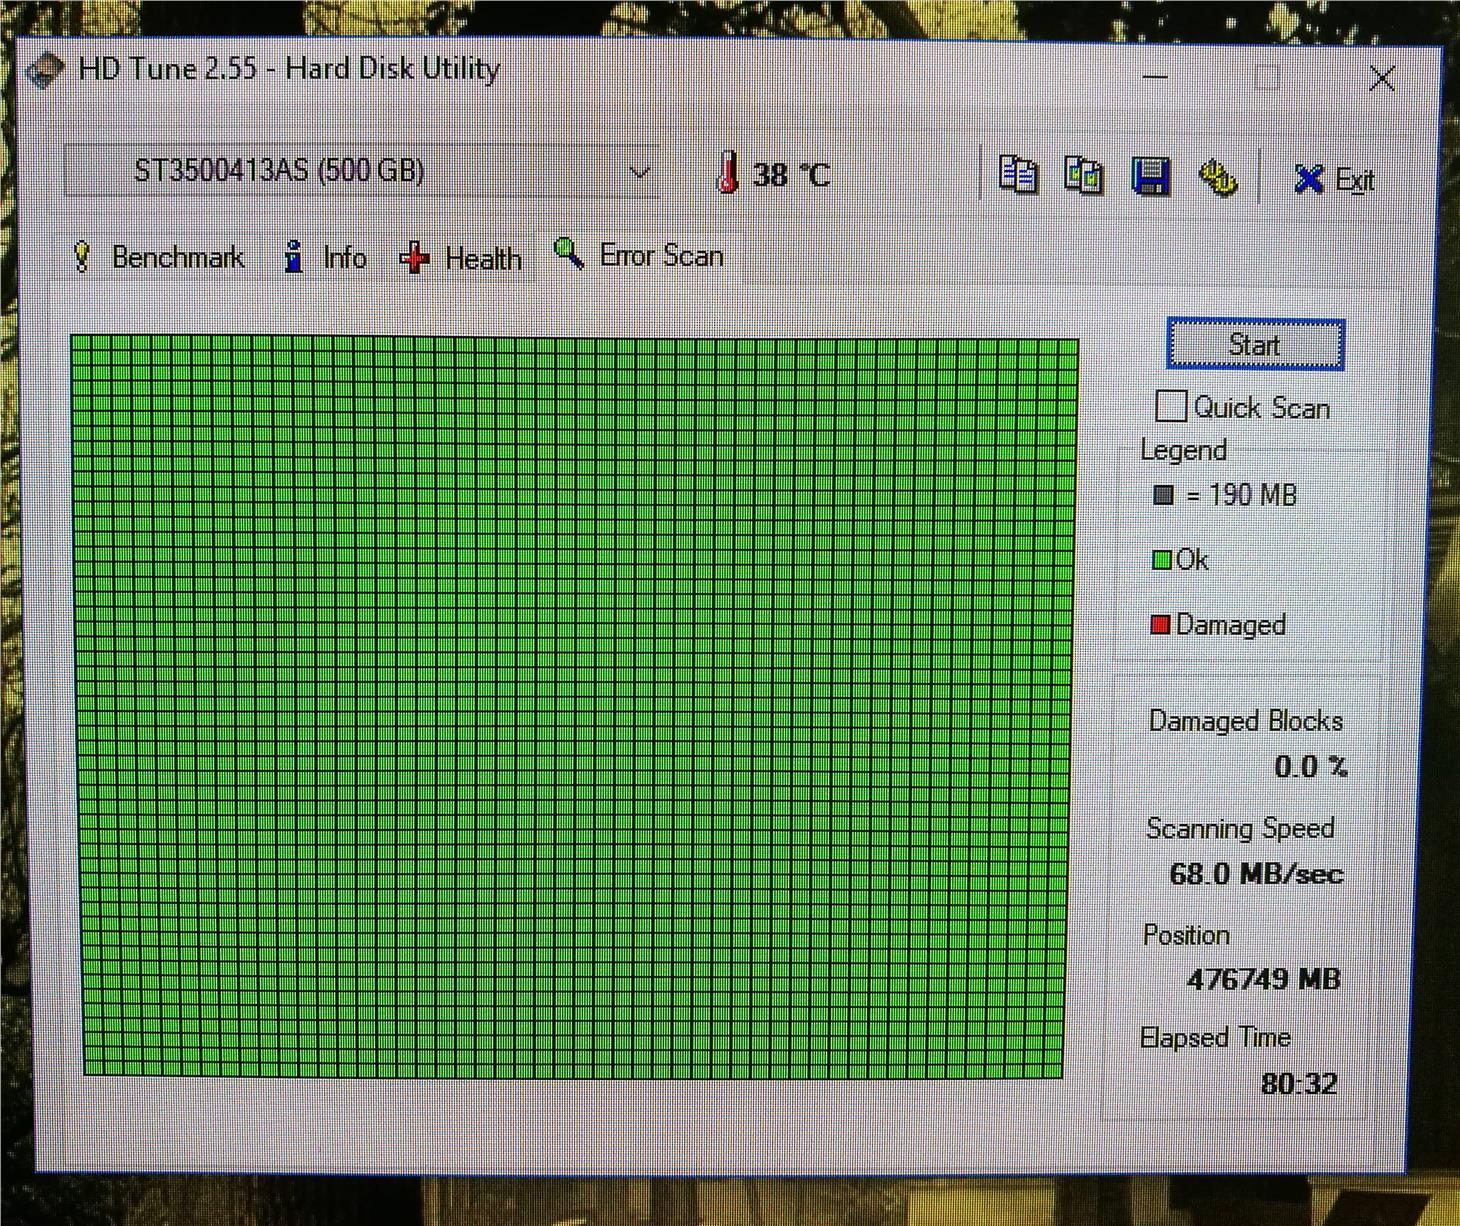 Seagate Barracuda Hard Disk 500gb Sa End 9 12 2019 415 Pm Hardisk Internal Pc Sata 35 Inch